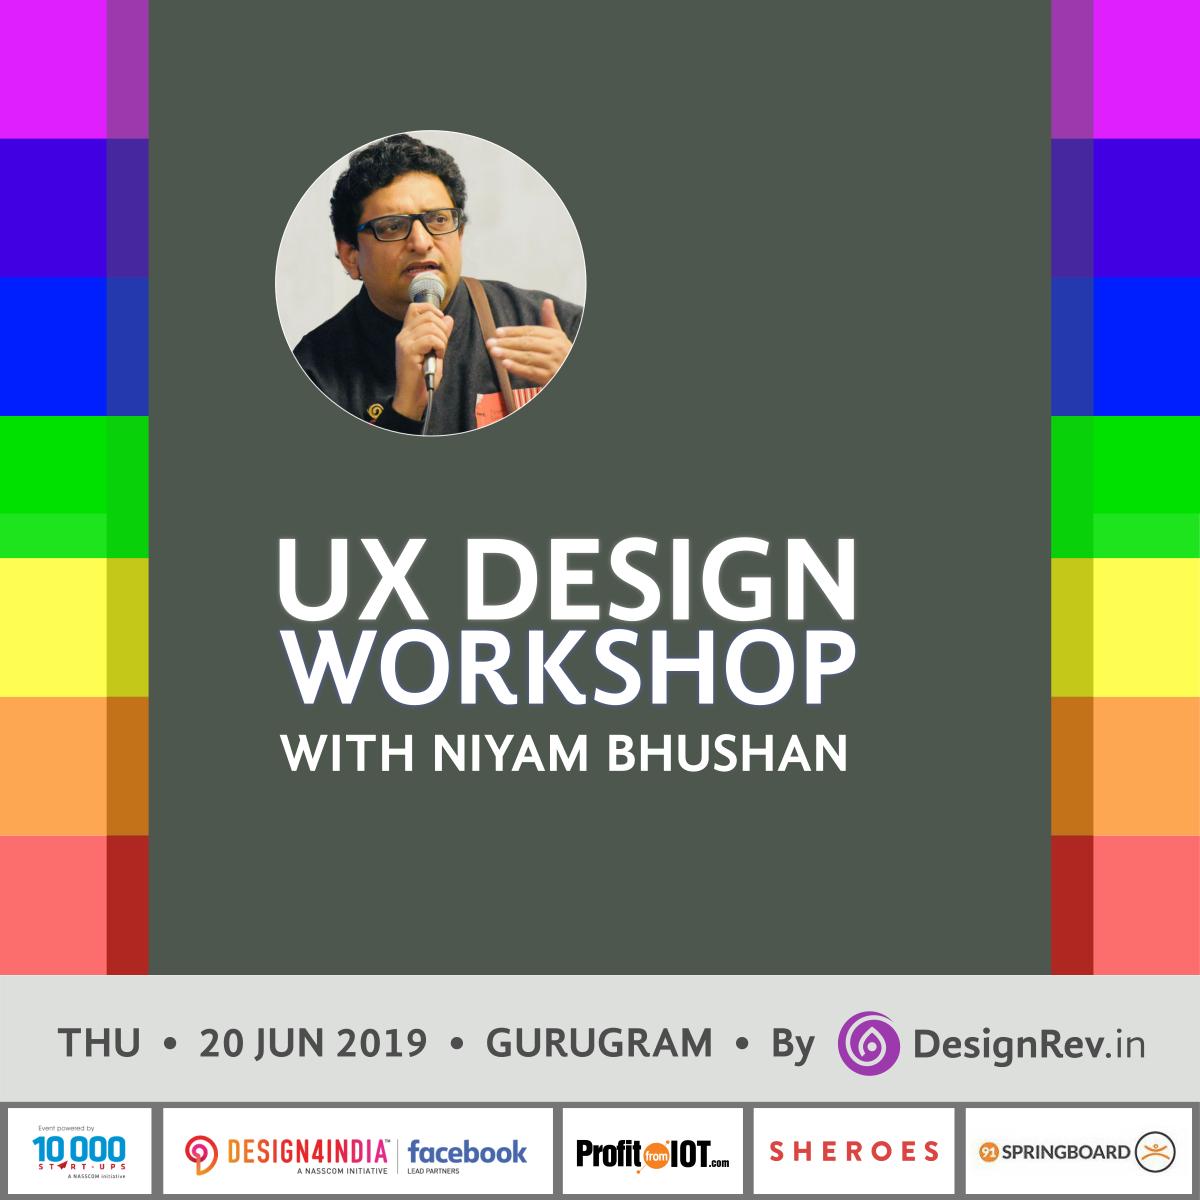 43rd UX Design Workshop with Niyam Bhushan on 20 Jun 2019 in Gurugram